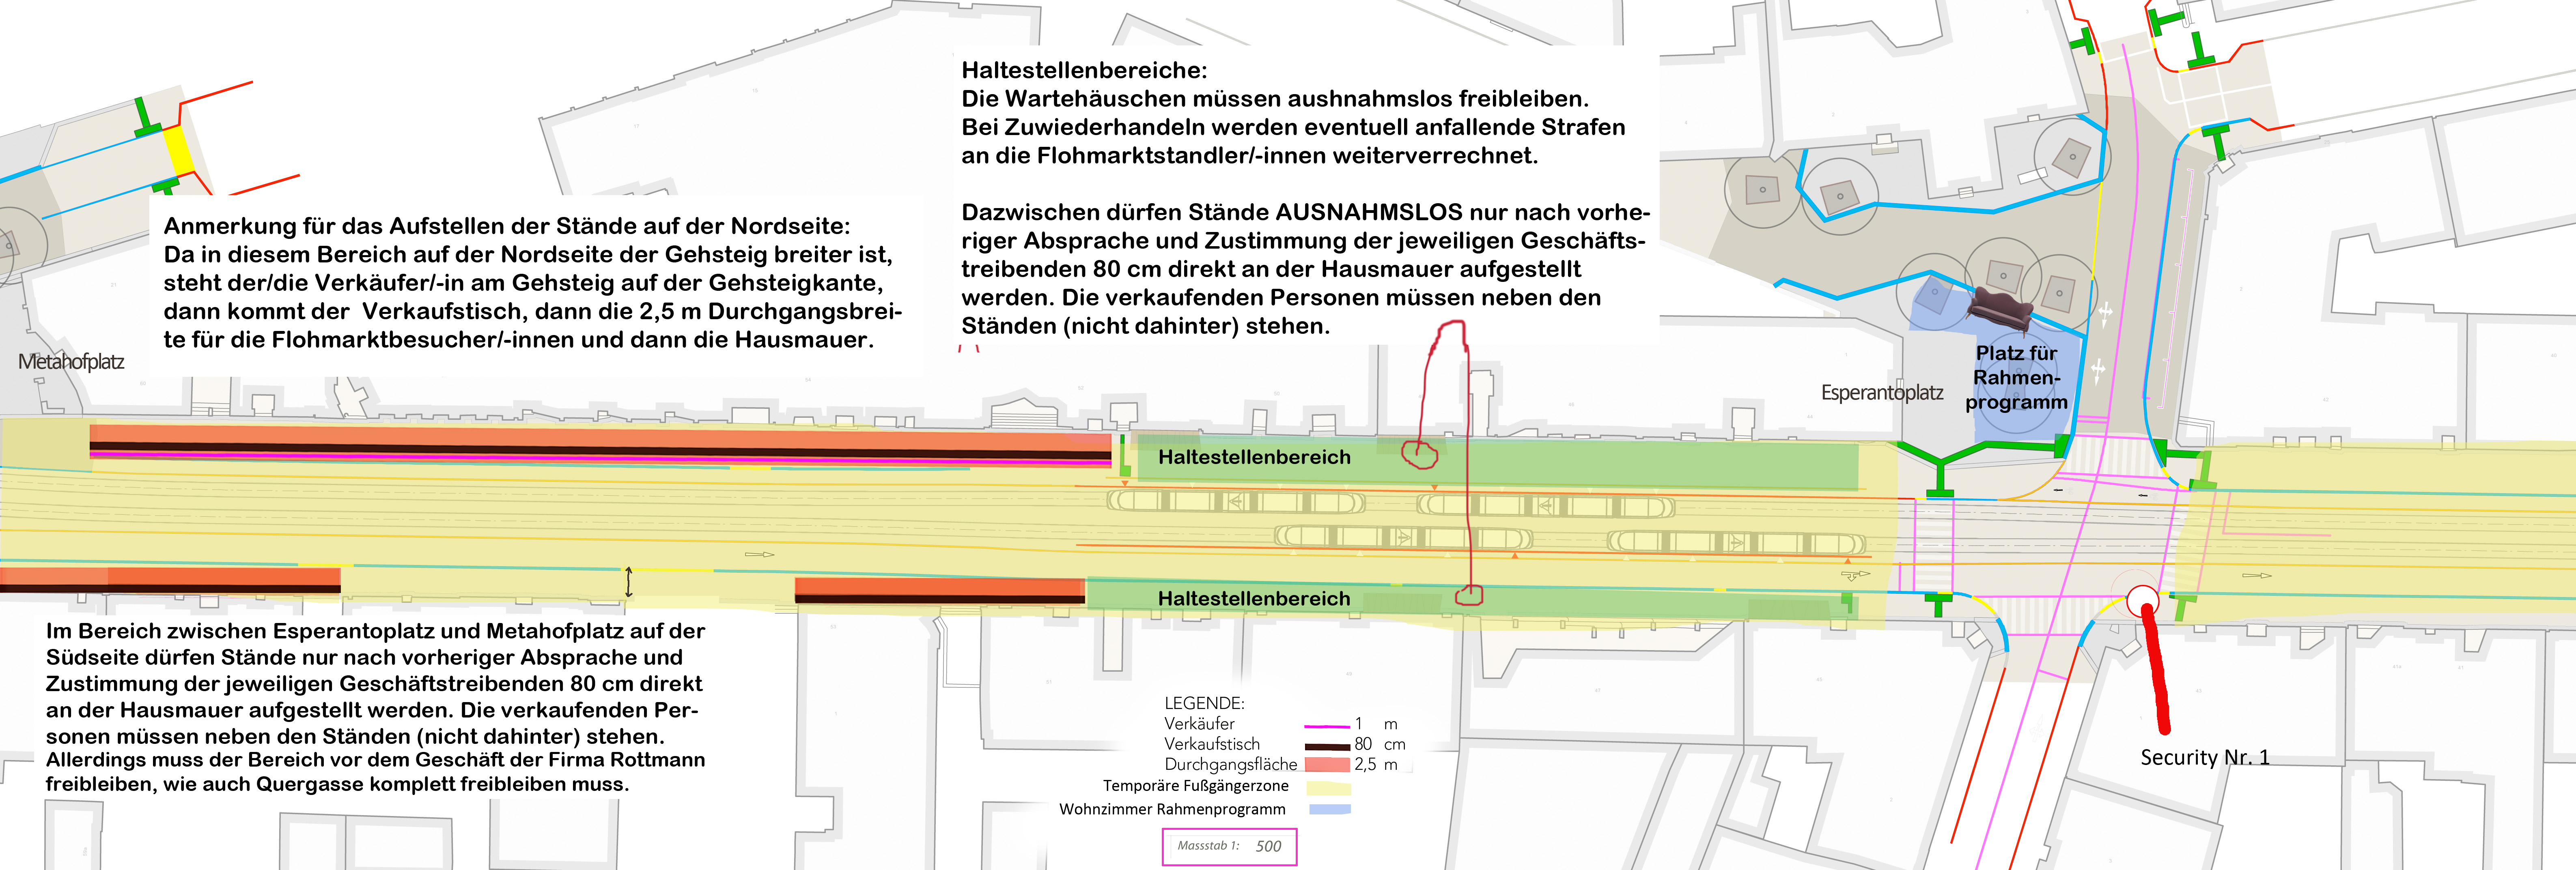 flohmarkt_esperanto-metahof